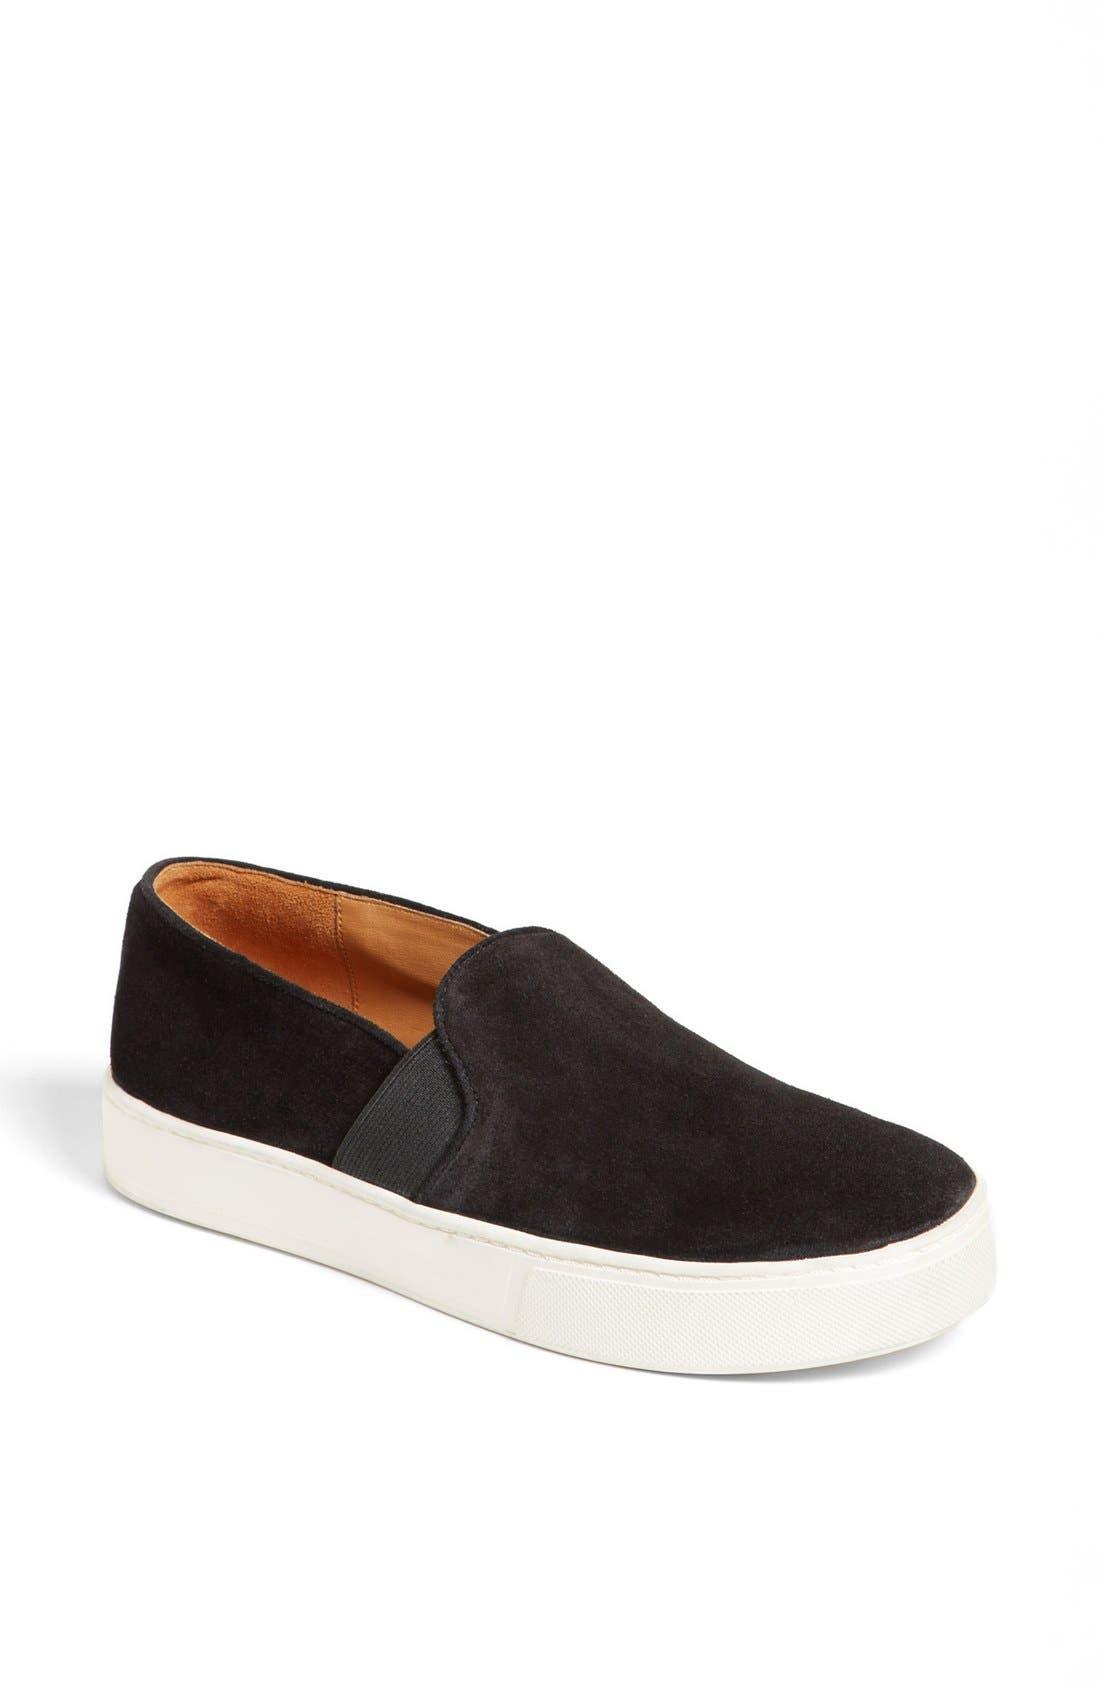 'Blair 3' Sneaker,                             Main thumbnail 1, color,                             Black